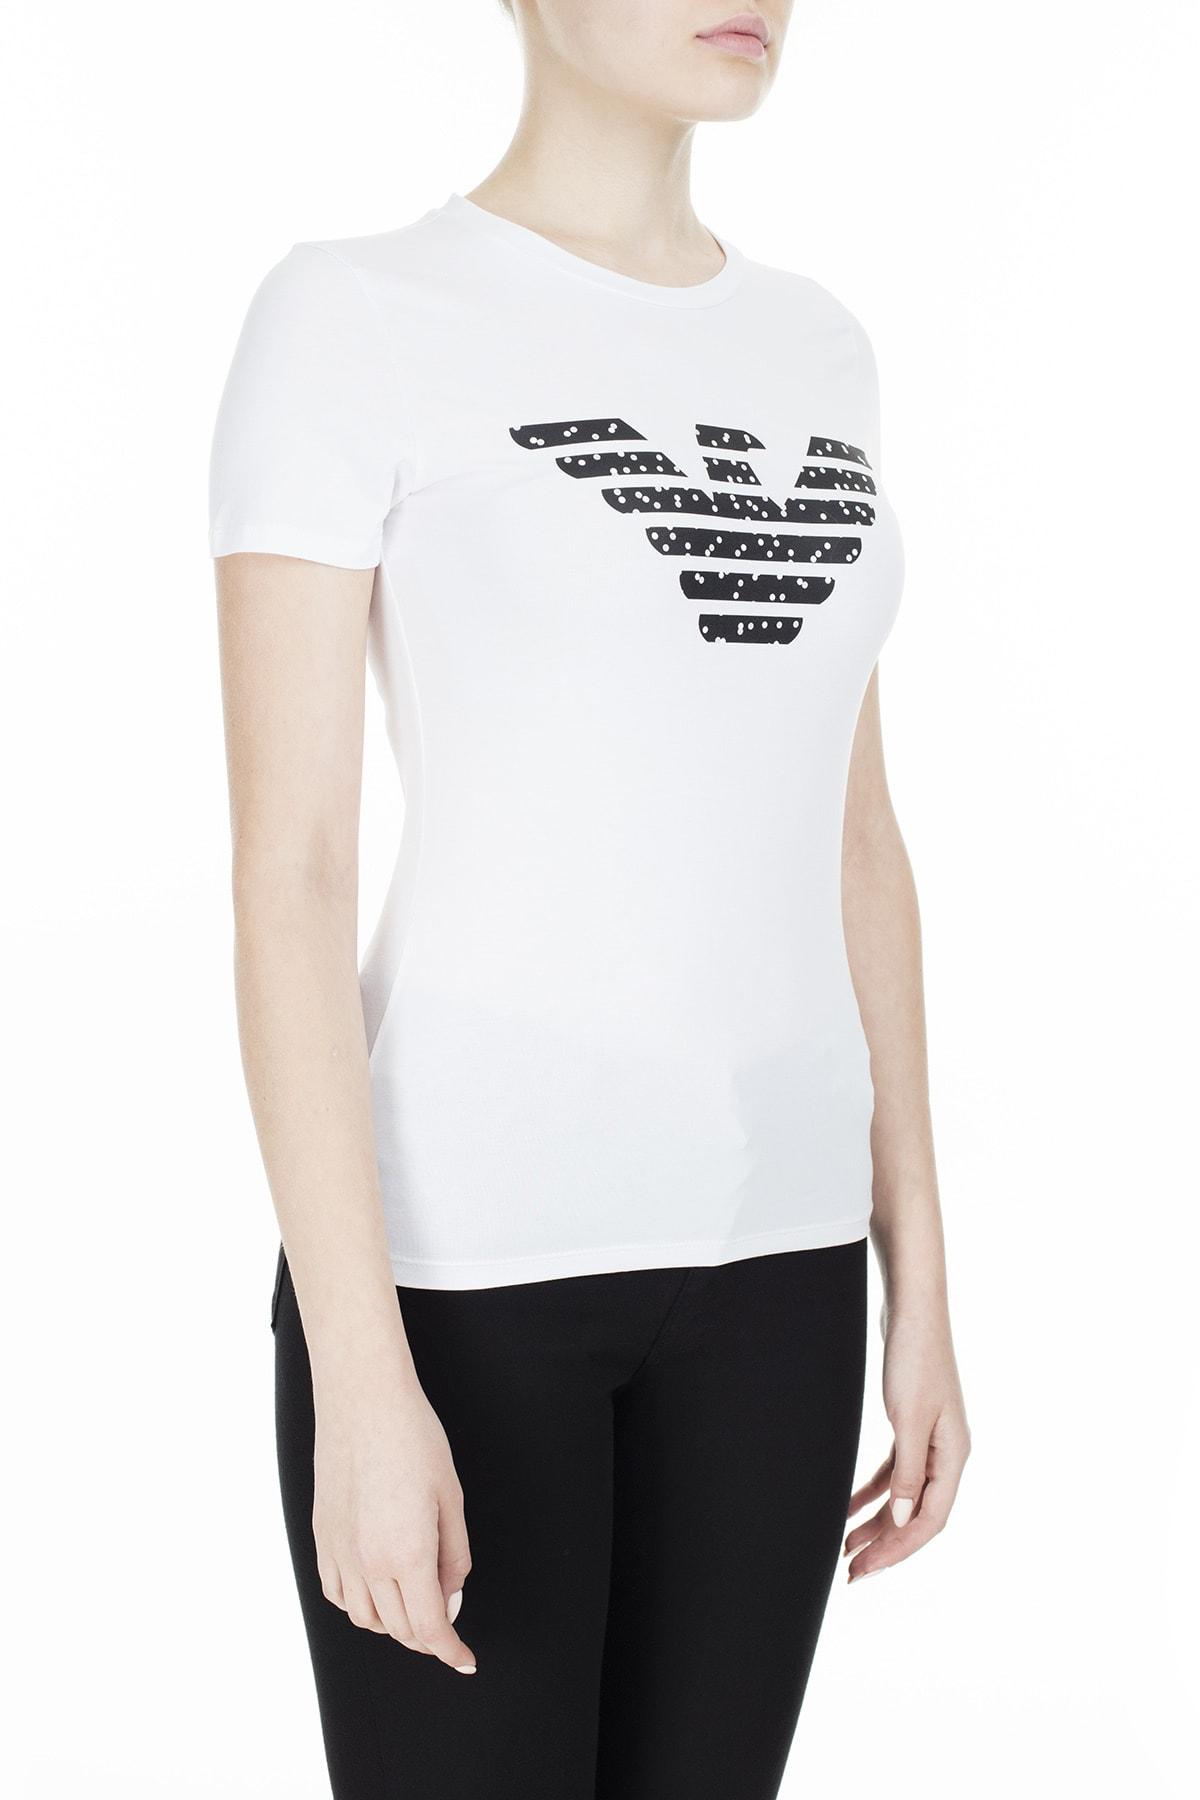 Emporio Armani T Shirt Kadın T Shirt S 6G2T7N 2J07Z 0100 S 6G2T7N 2J07Z 0100 3